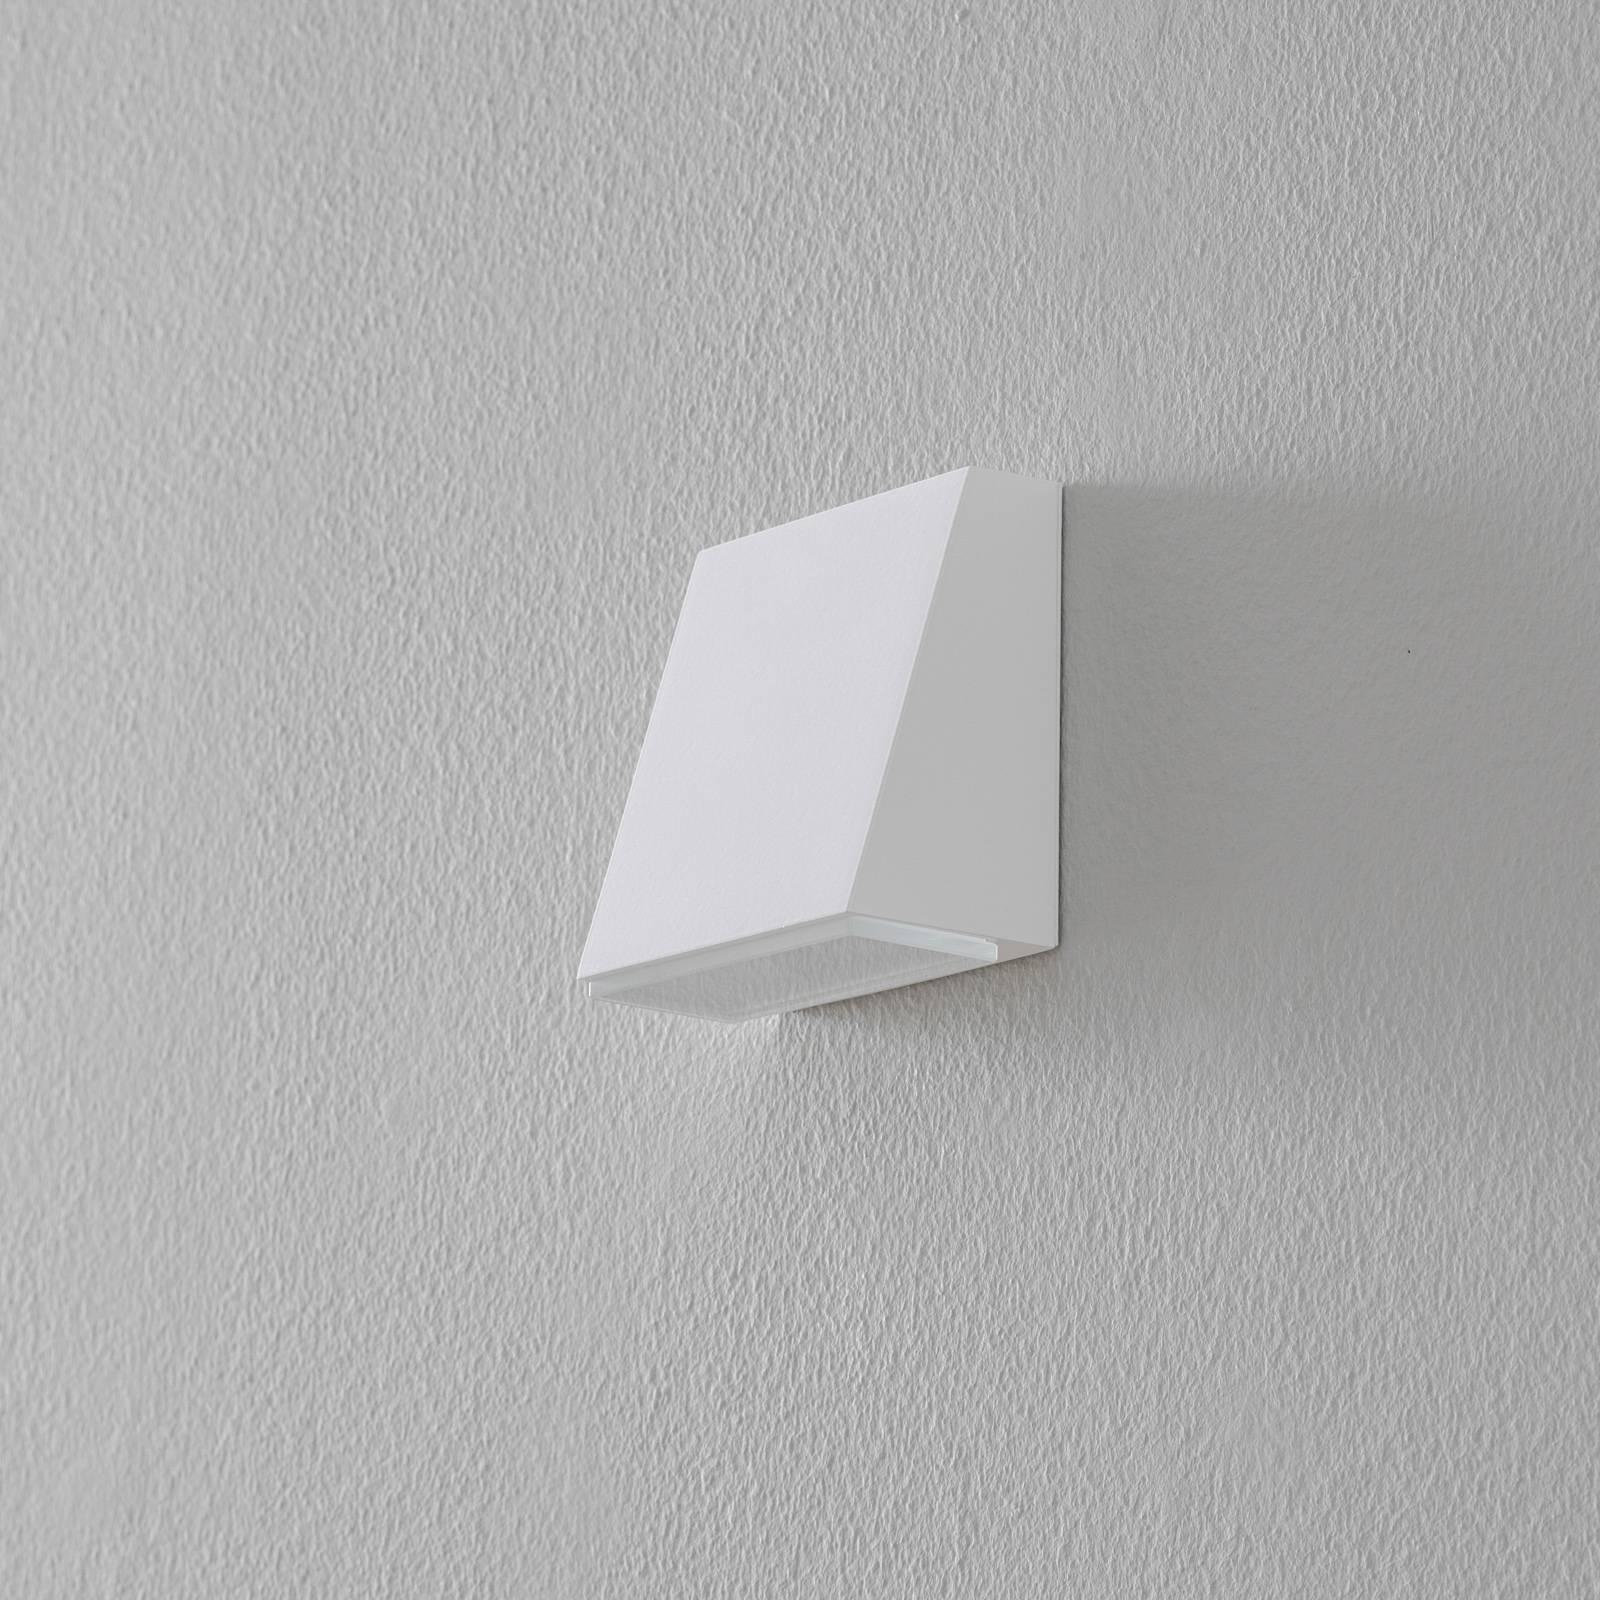 BEGA 78047 seinälamppu 3000K 9cm valkoinen 255lm